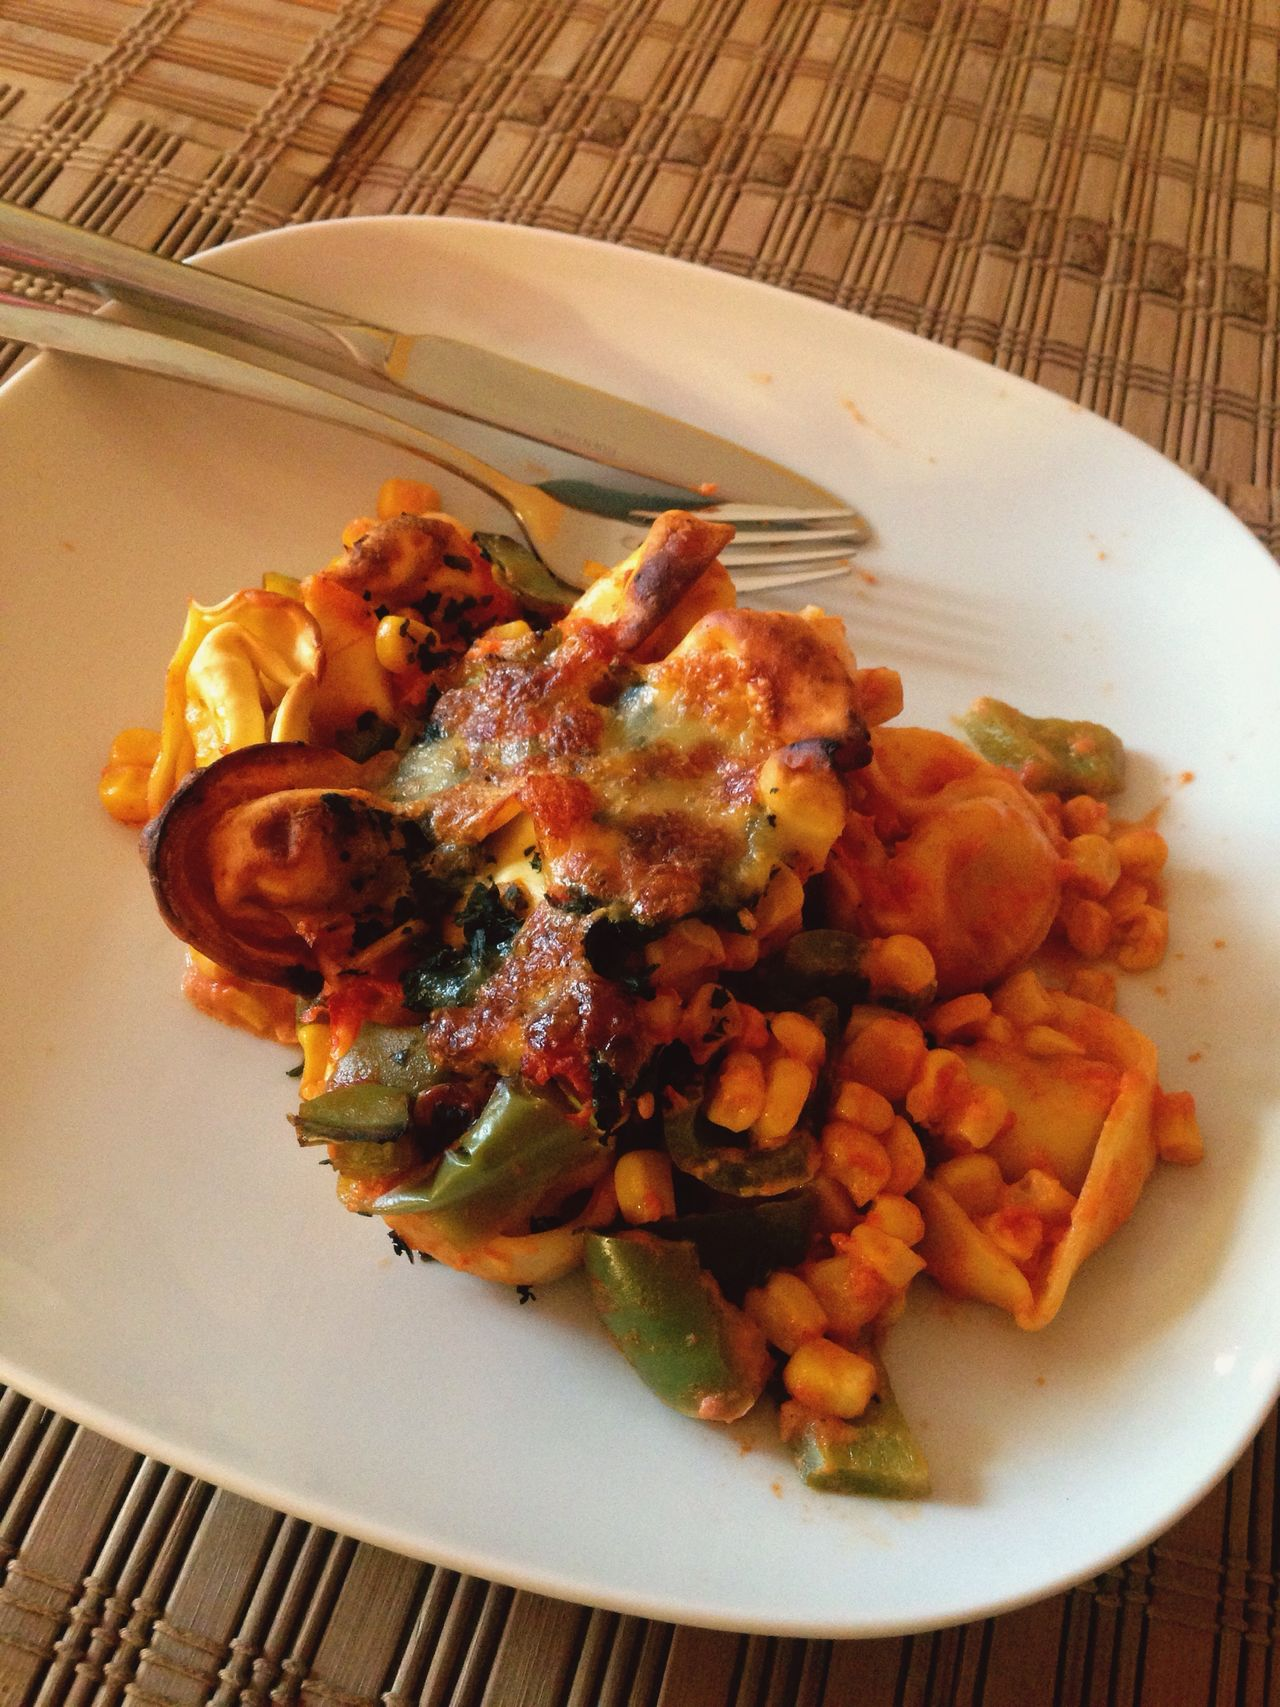 Food Tortelliniauflauf Ready-to-eat Apetit Lecker Healthy Eating Vegetable Schmackhaft Plate No People Tasty Mittagessen Lunch